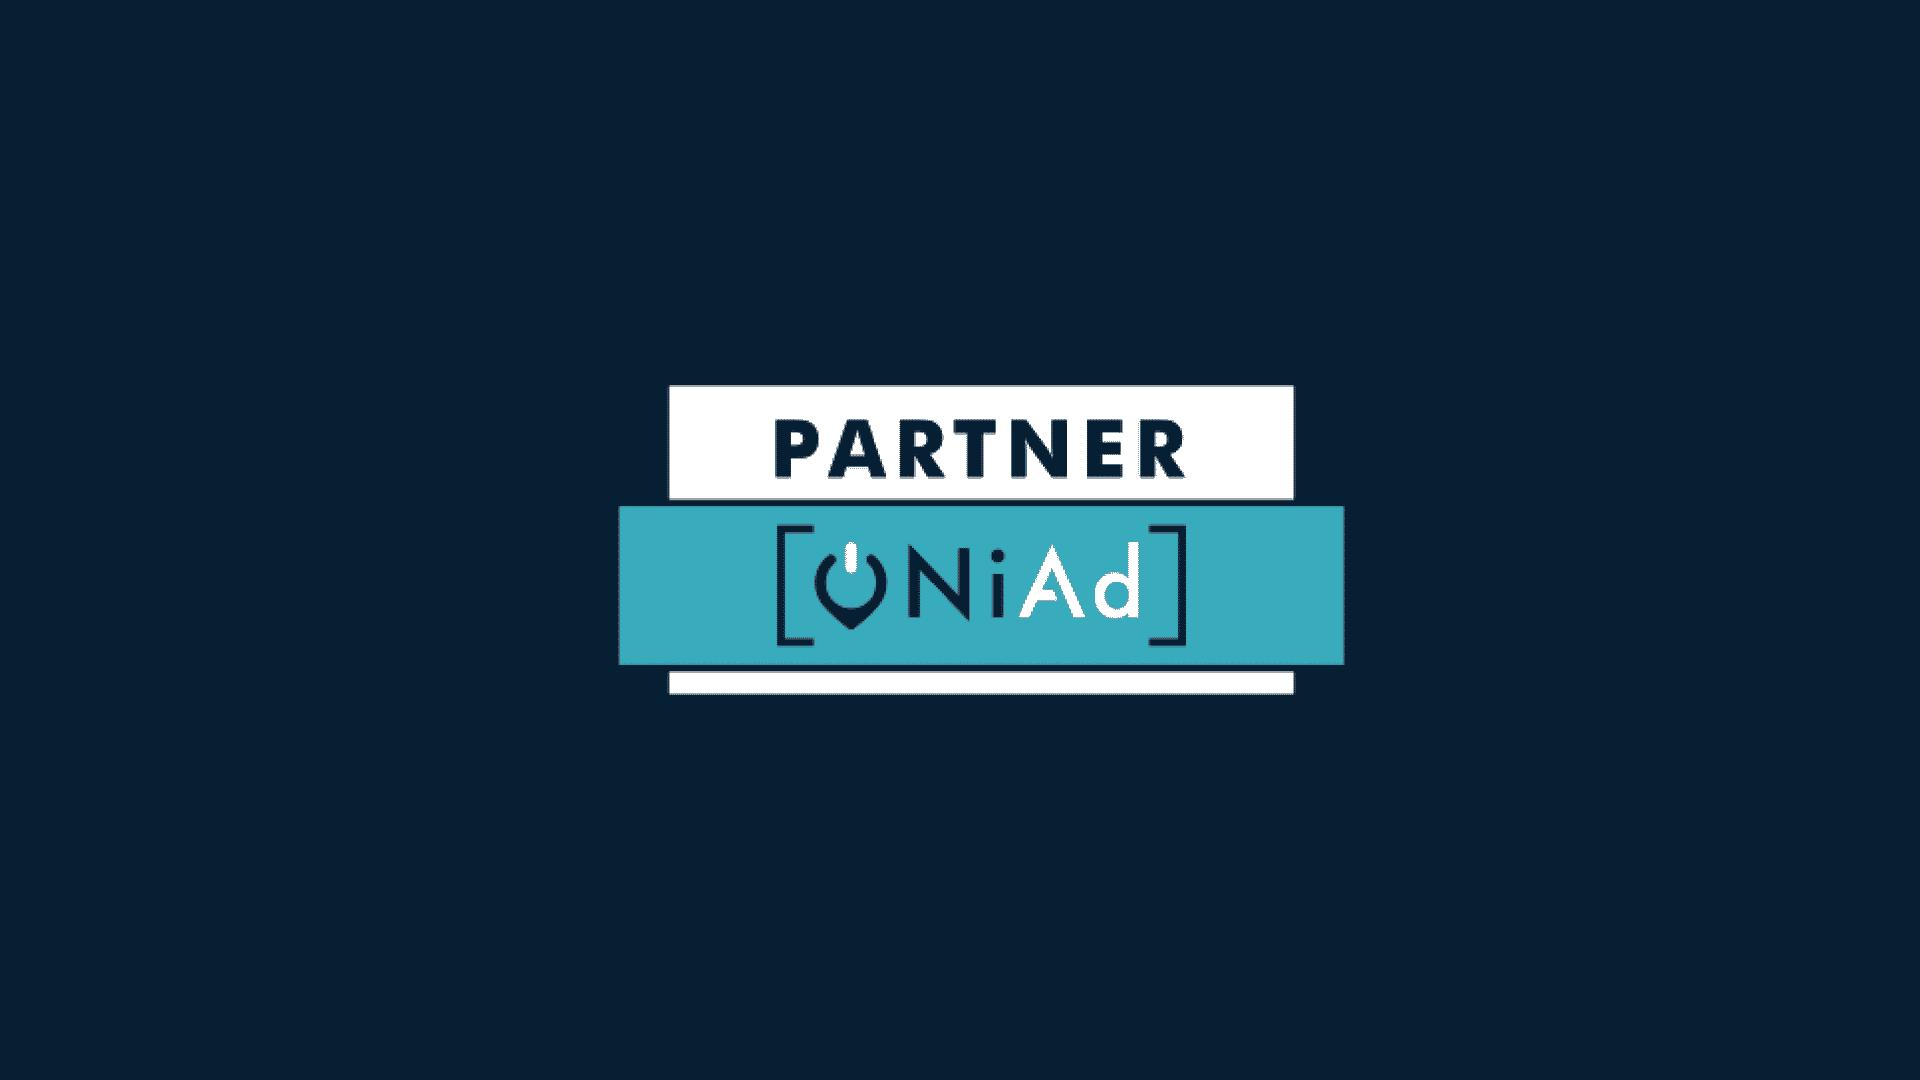 Agencia partner OniAd